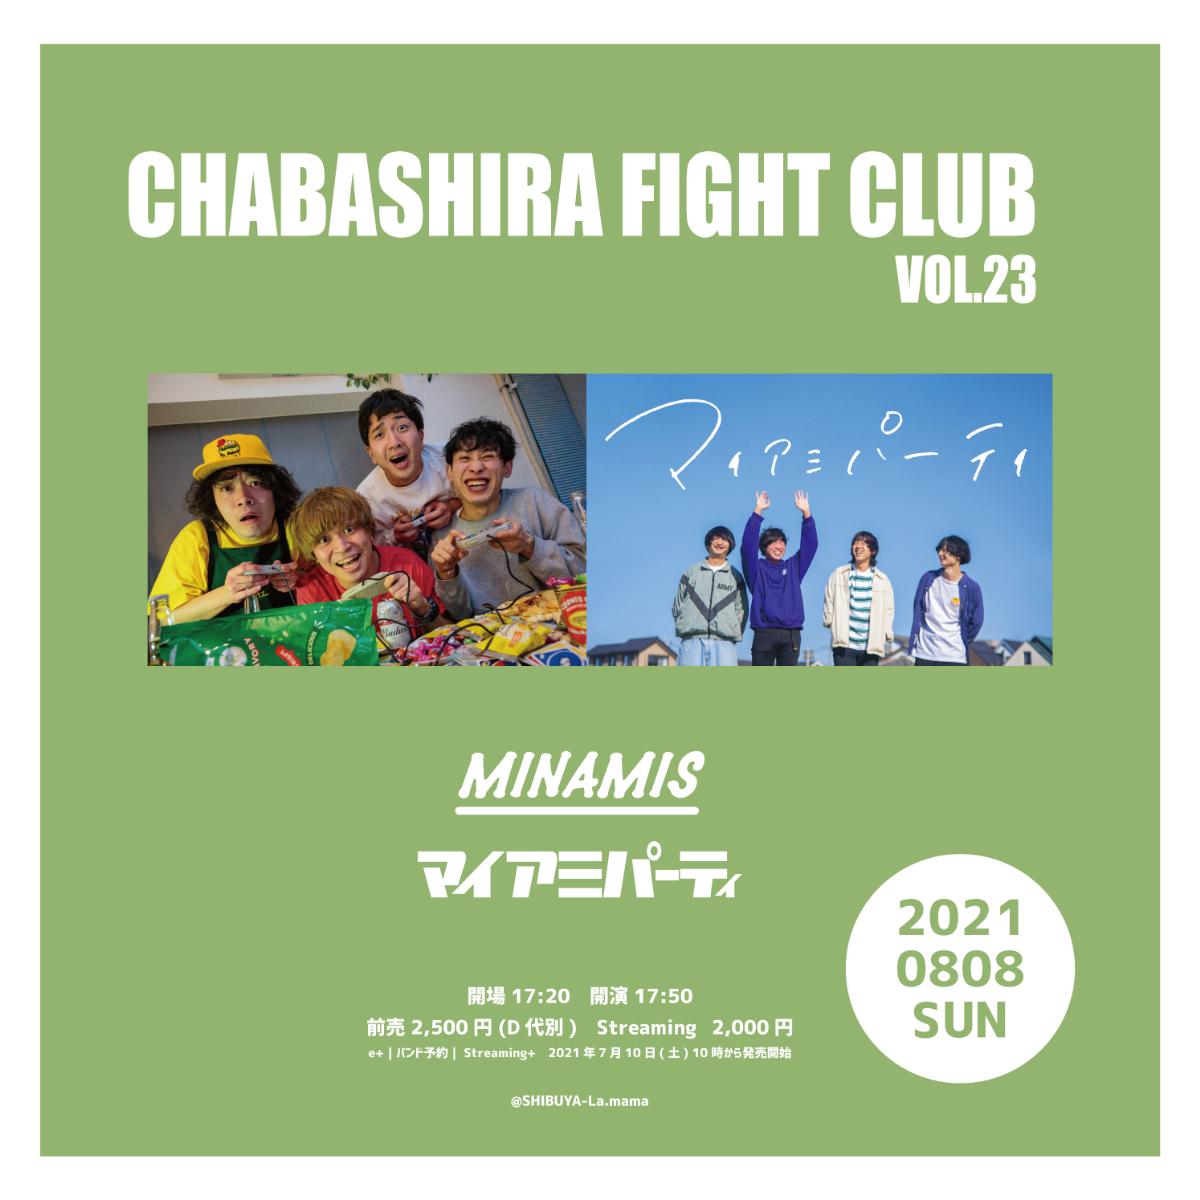 MINAMIS Presents 『CHABASHIRA FIGHT CLUB VOL.23』フライヤー